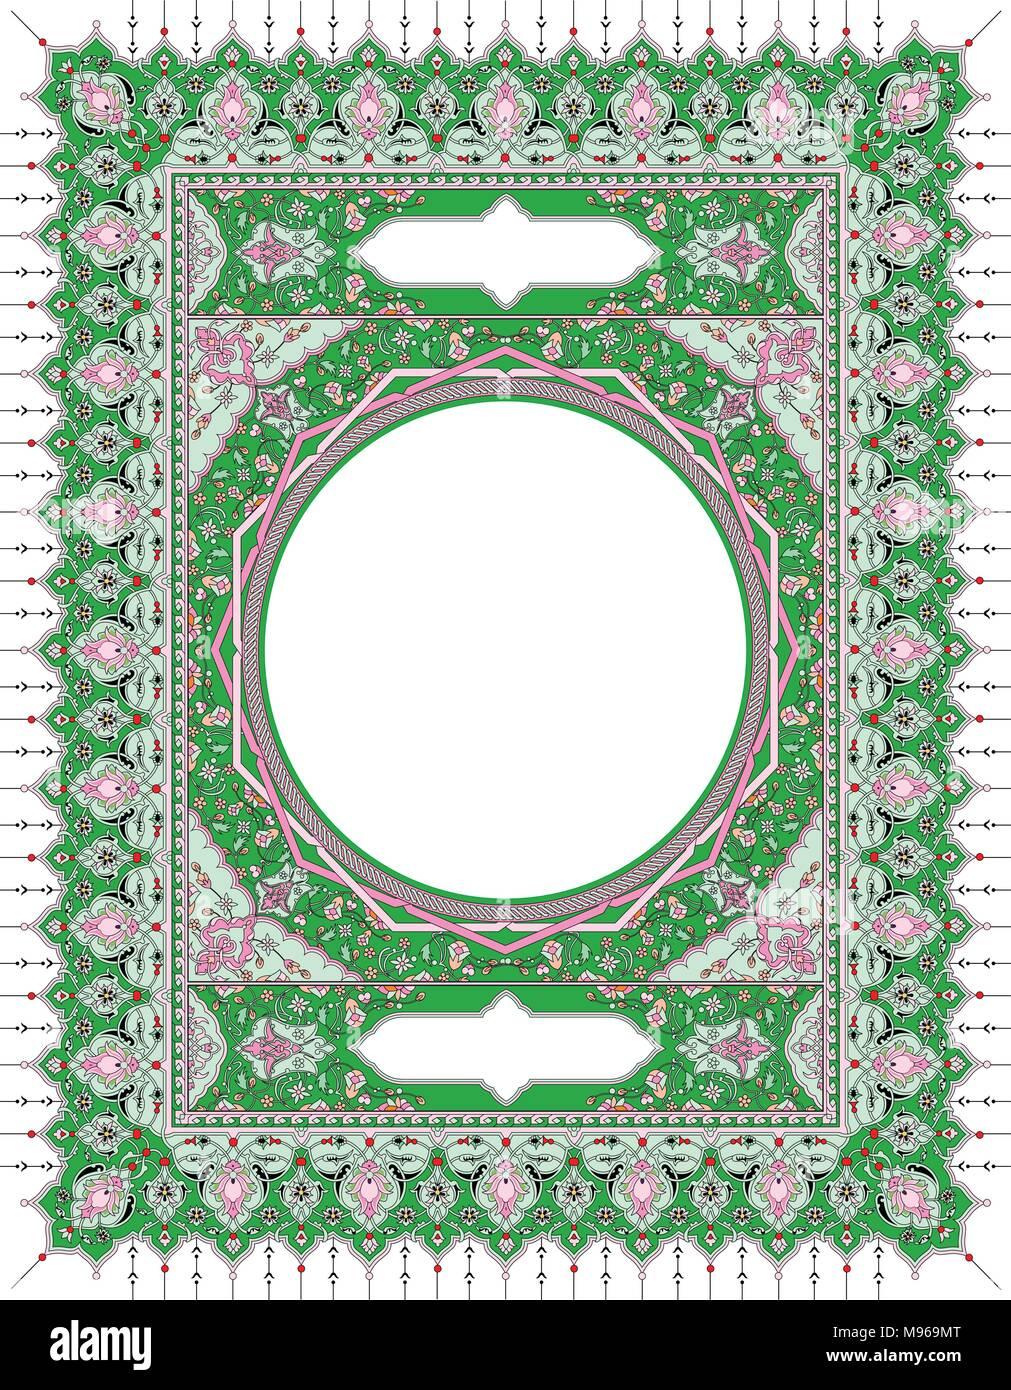 Border & Frames Islamic Art Stock Vector Art & Illustration, Vector ...